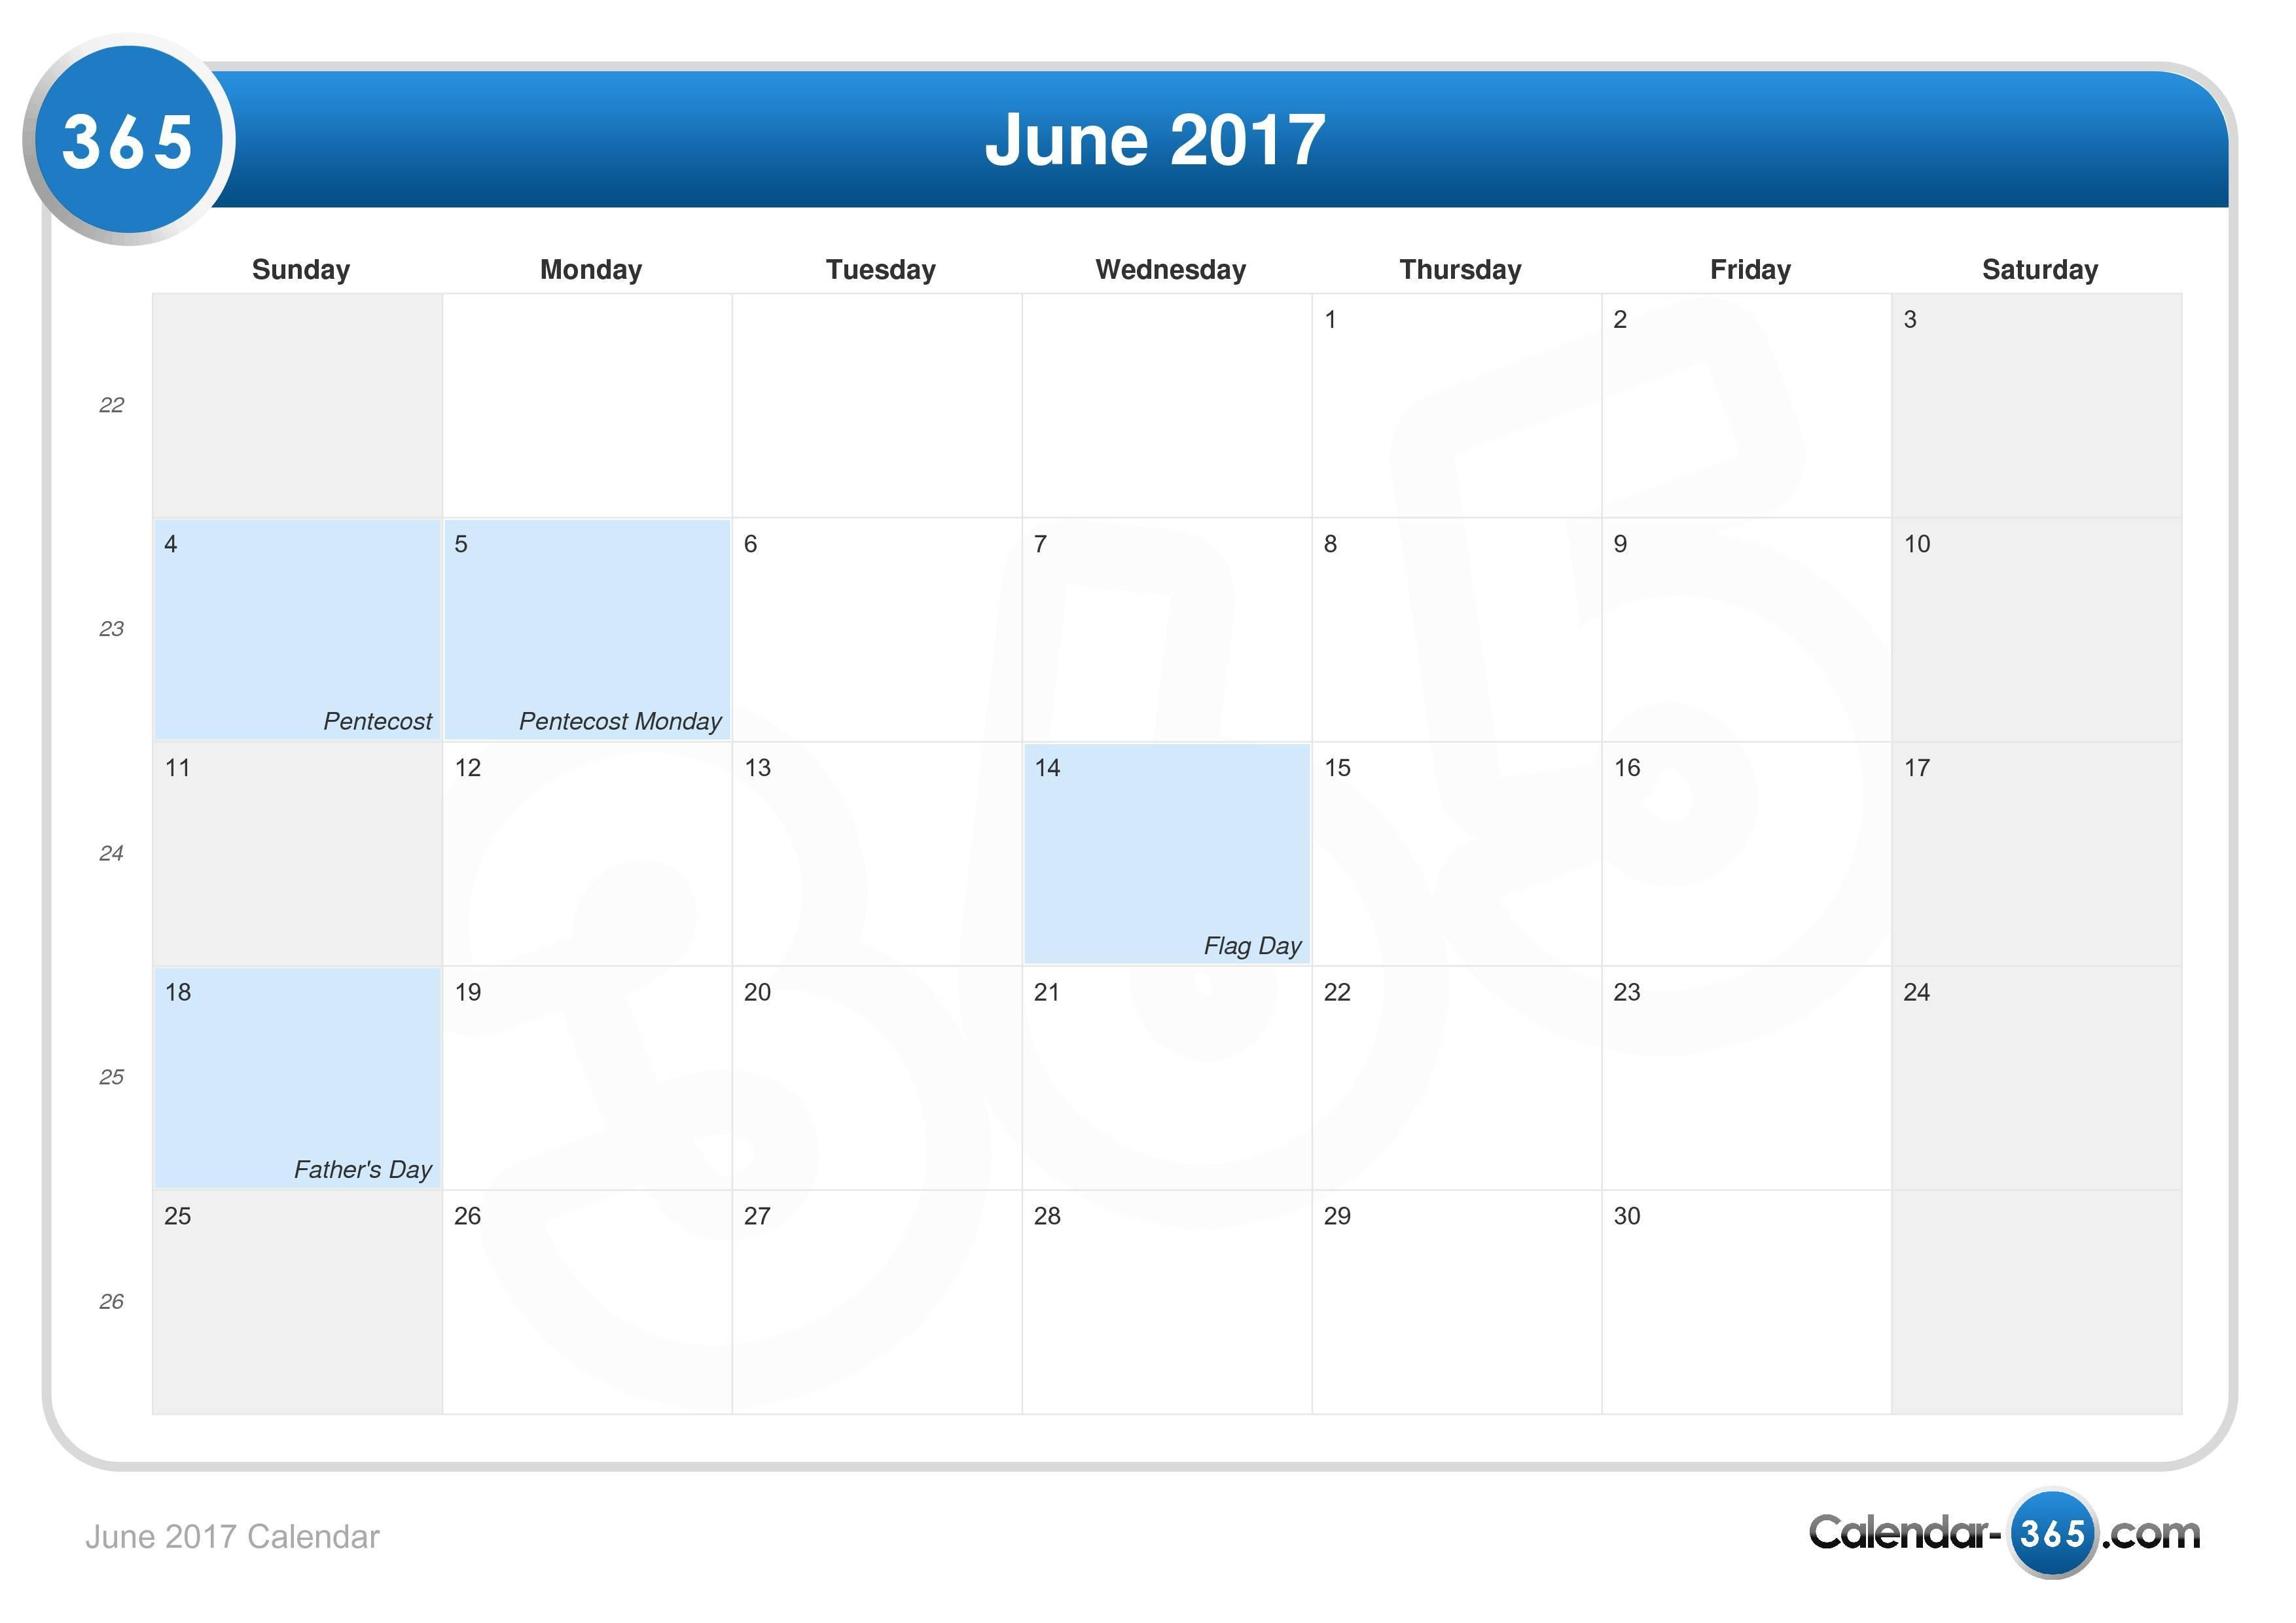 june-2017-calendar.jpg